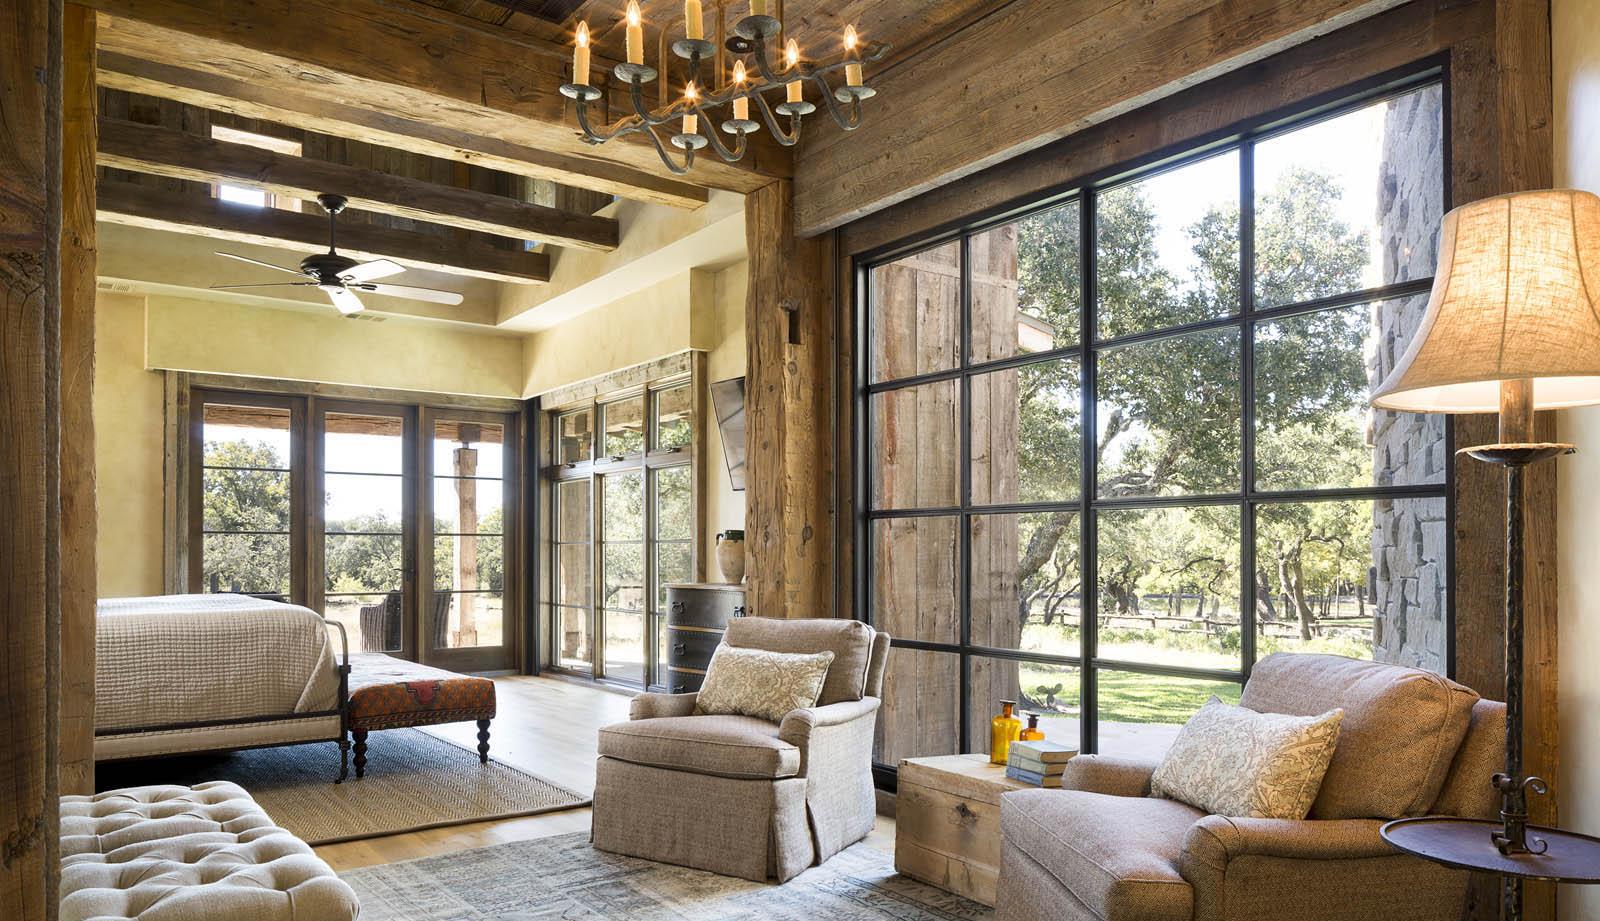 Llano ranch j christopher architecture for Planimetrie ranch con 2 master suite